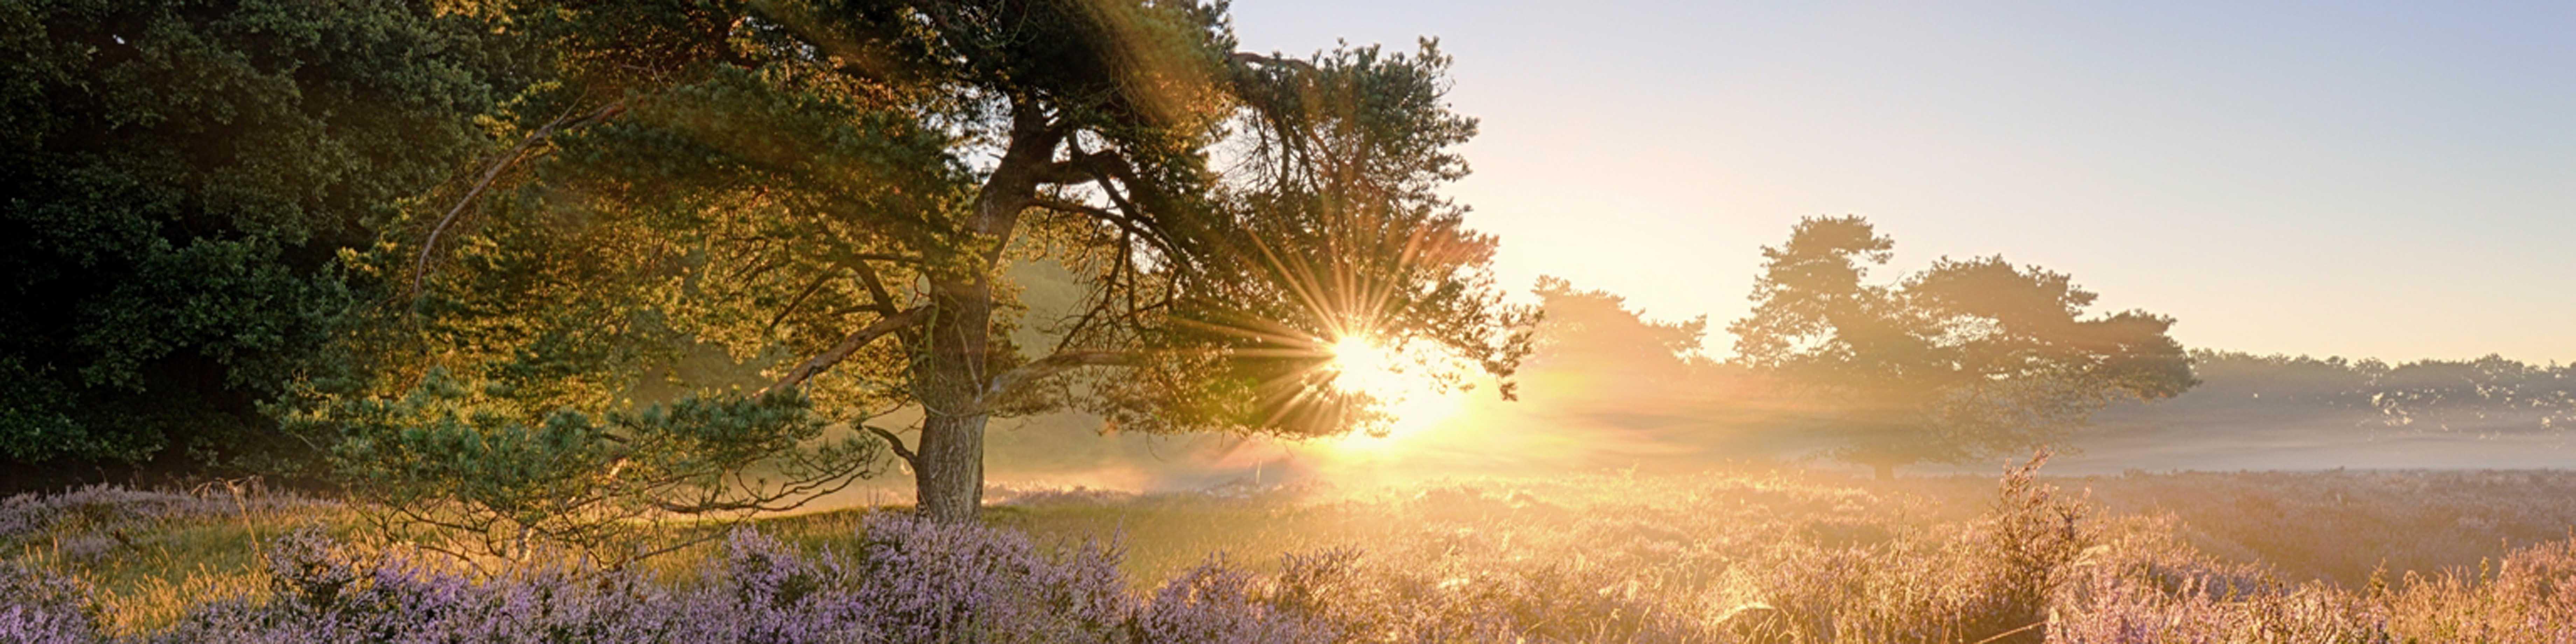 fotowandensgop.nl foto van zonsopkomst bloeiende paarse heide